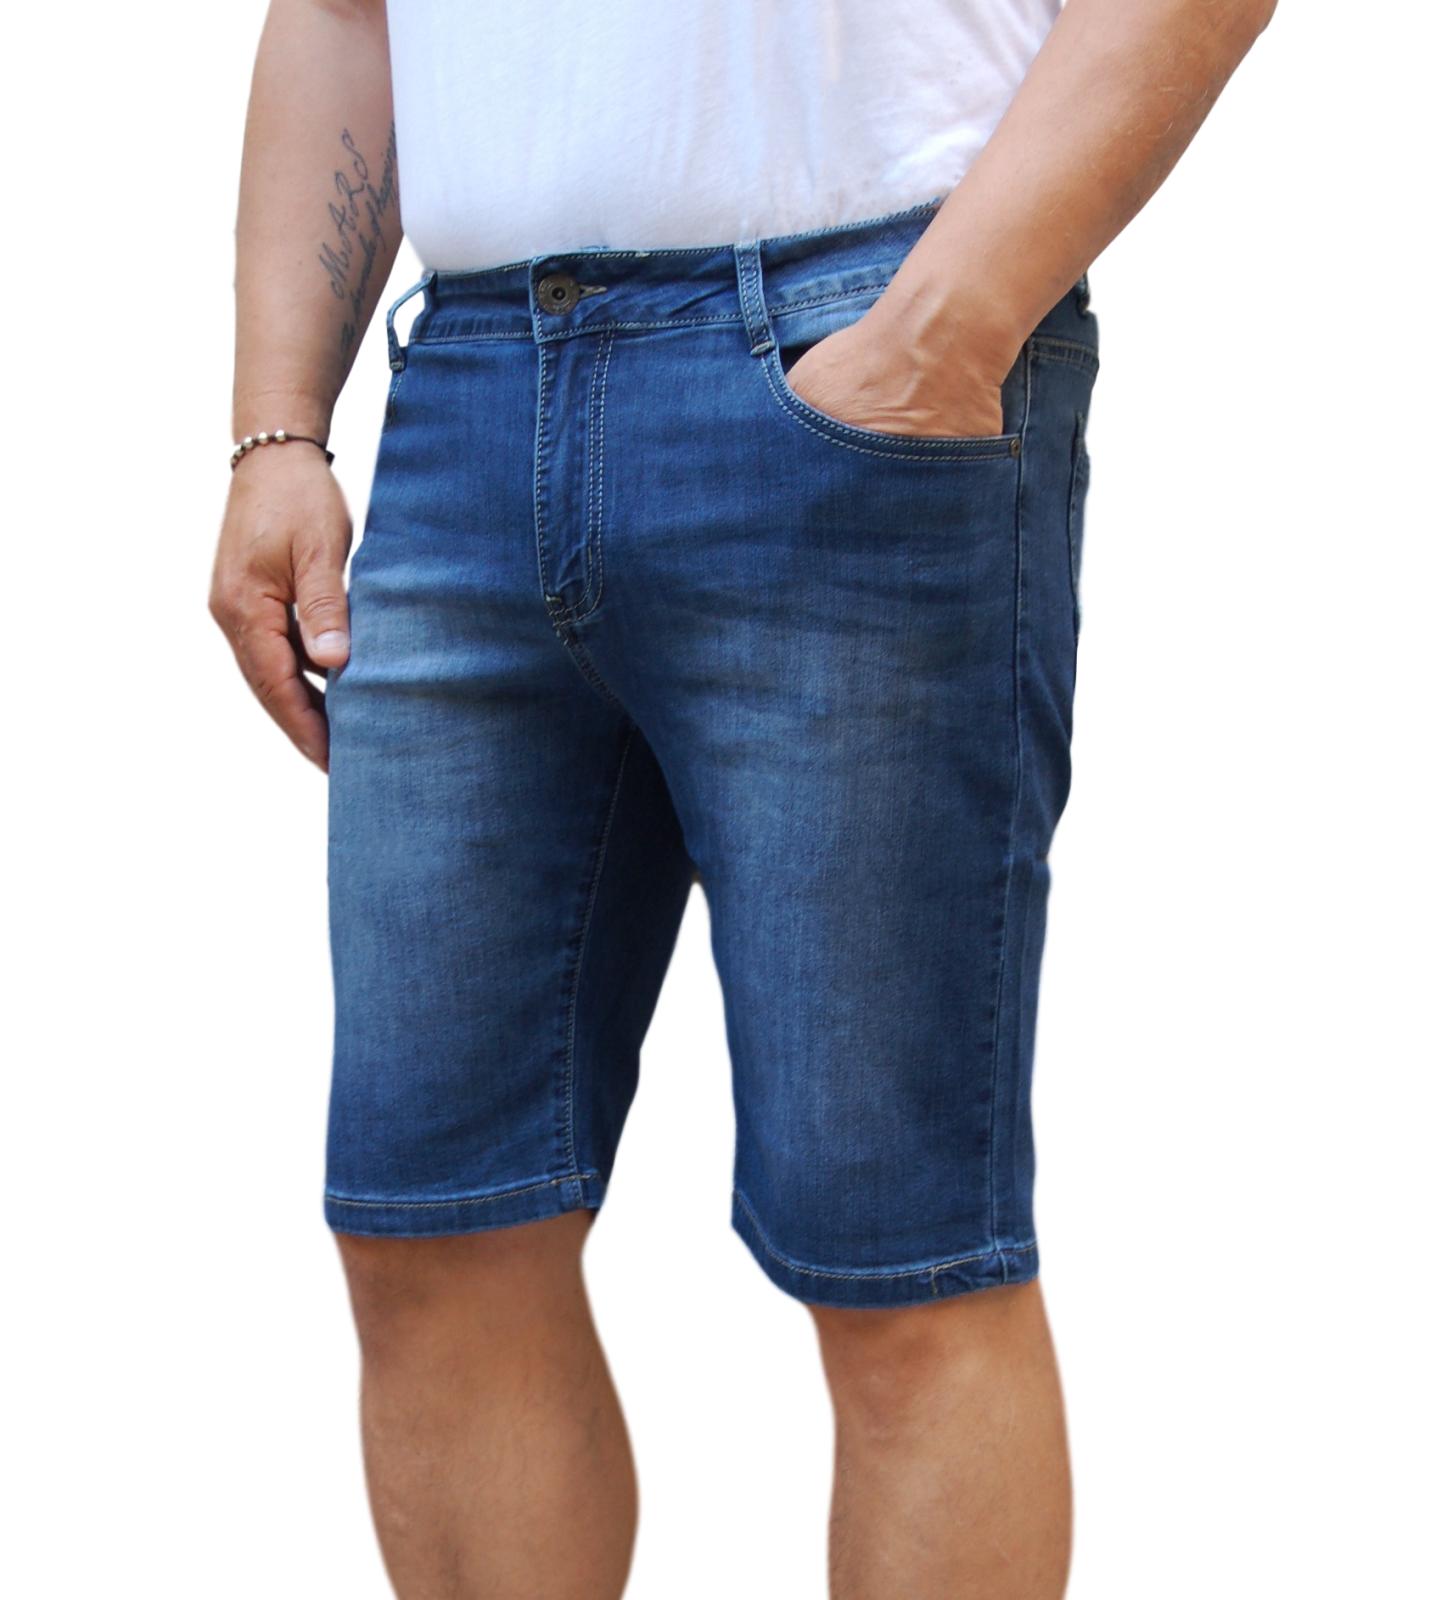 Bermuda-Uomo-Jeans-Denim-Corto-Tasche-America-Pantaloncino-Blu-Shorts-Casual-t miniatura 15